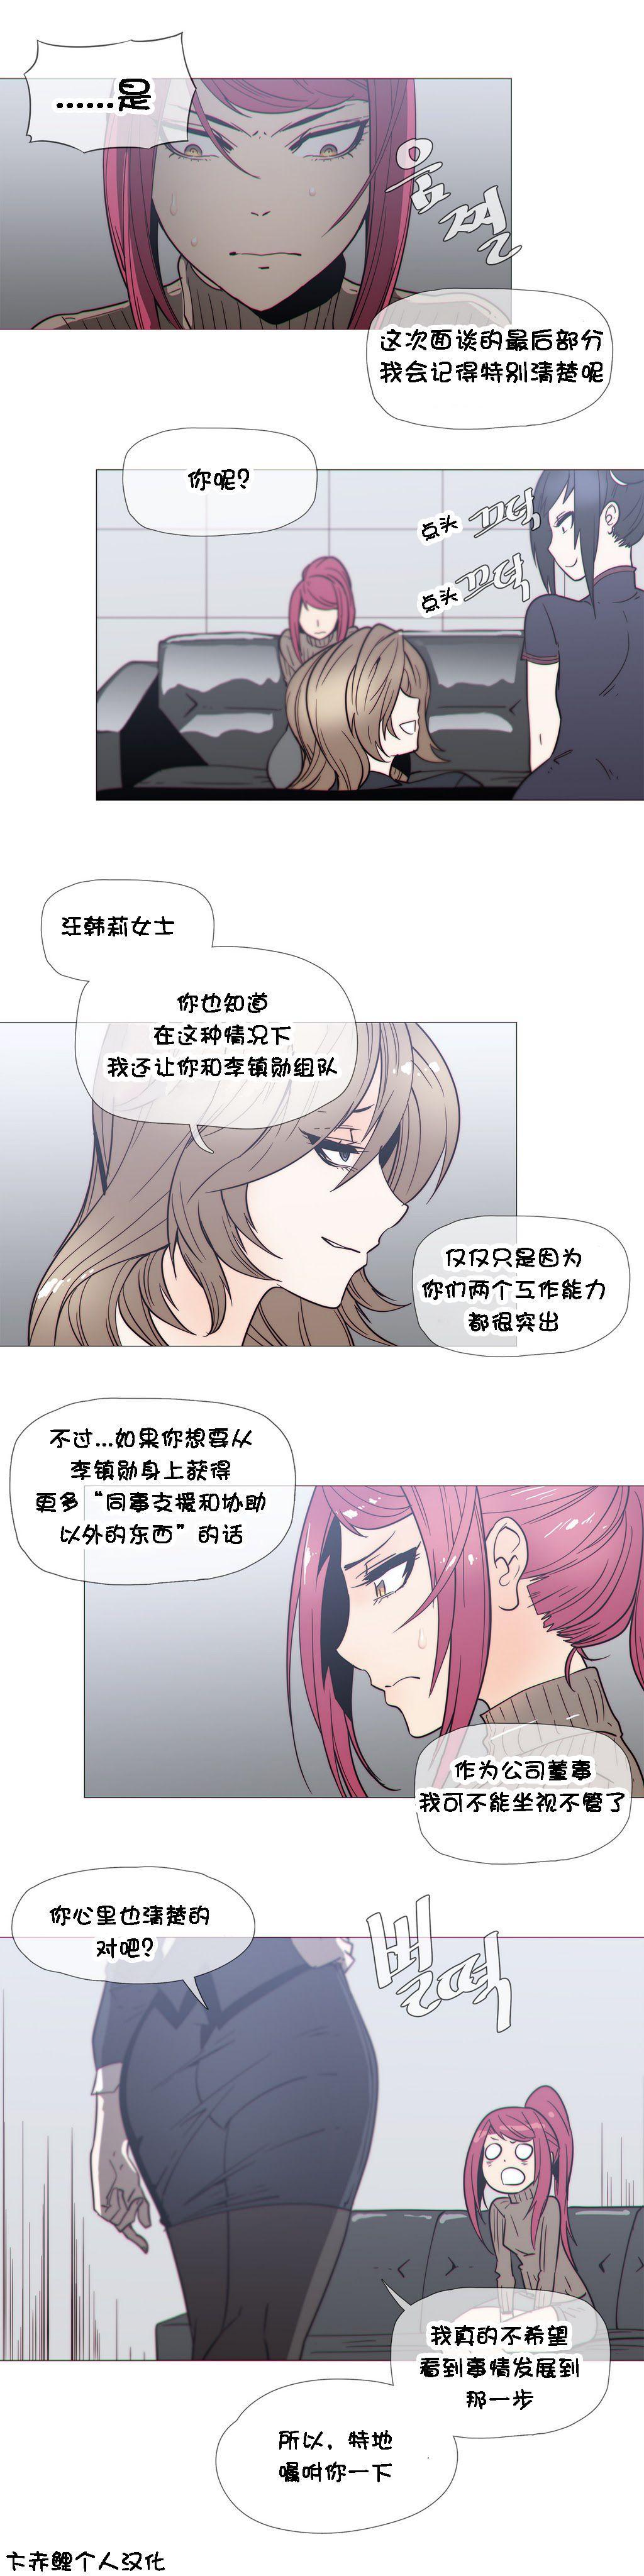 HouseHold Affairs 【卞赤鲤个人汉化】1~33话(持续更新中) 573